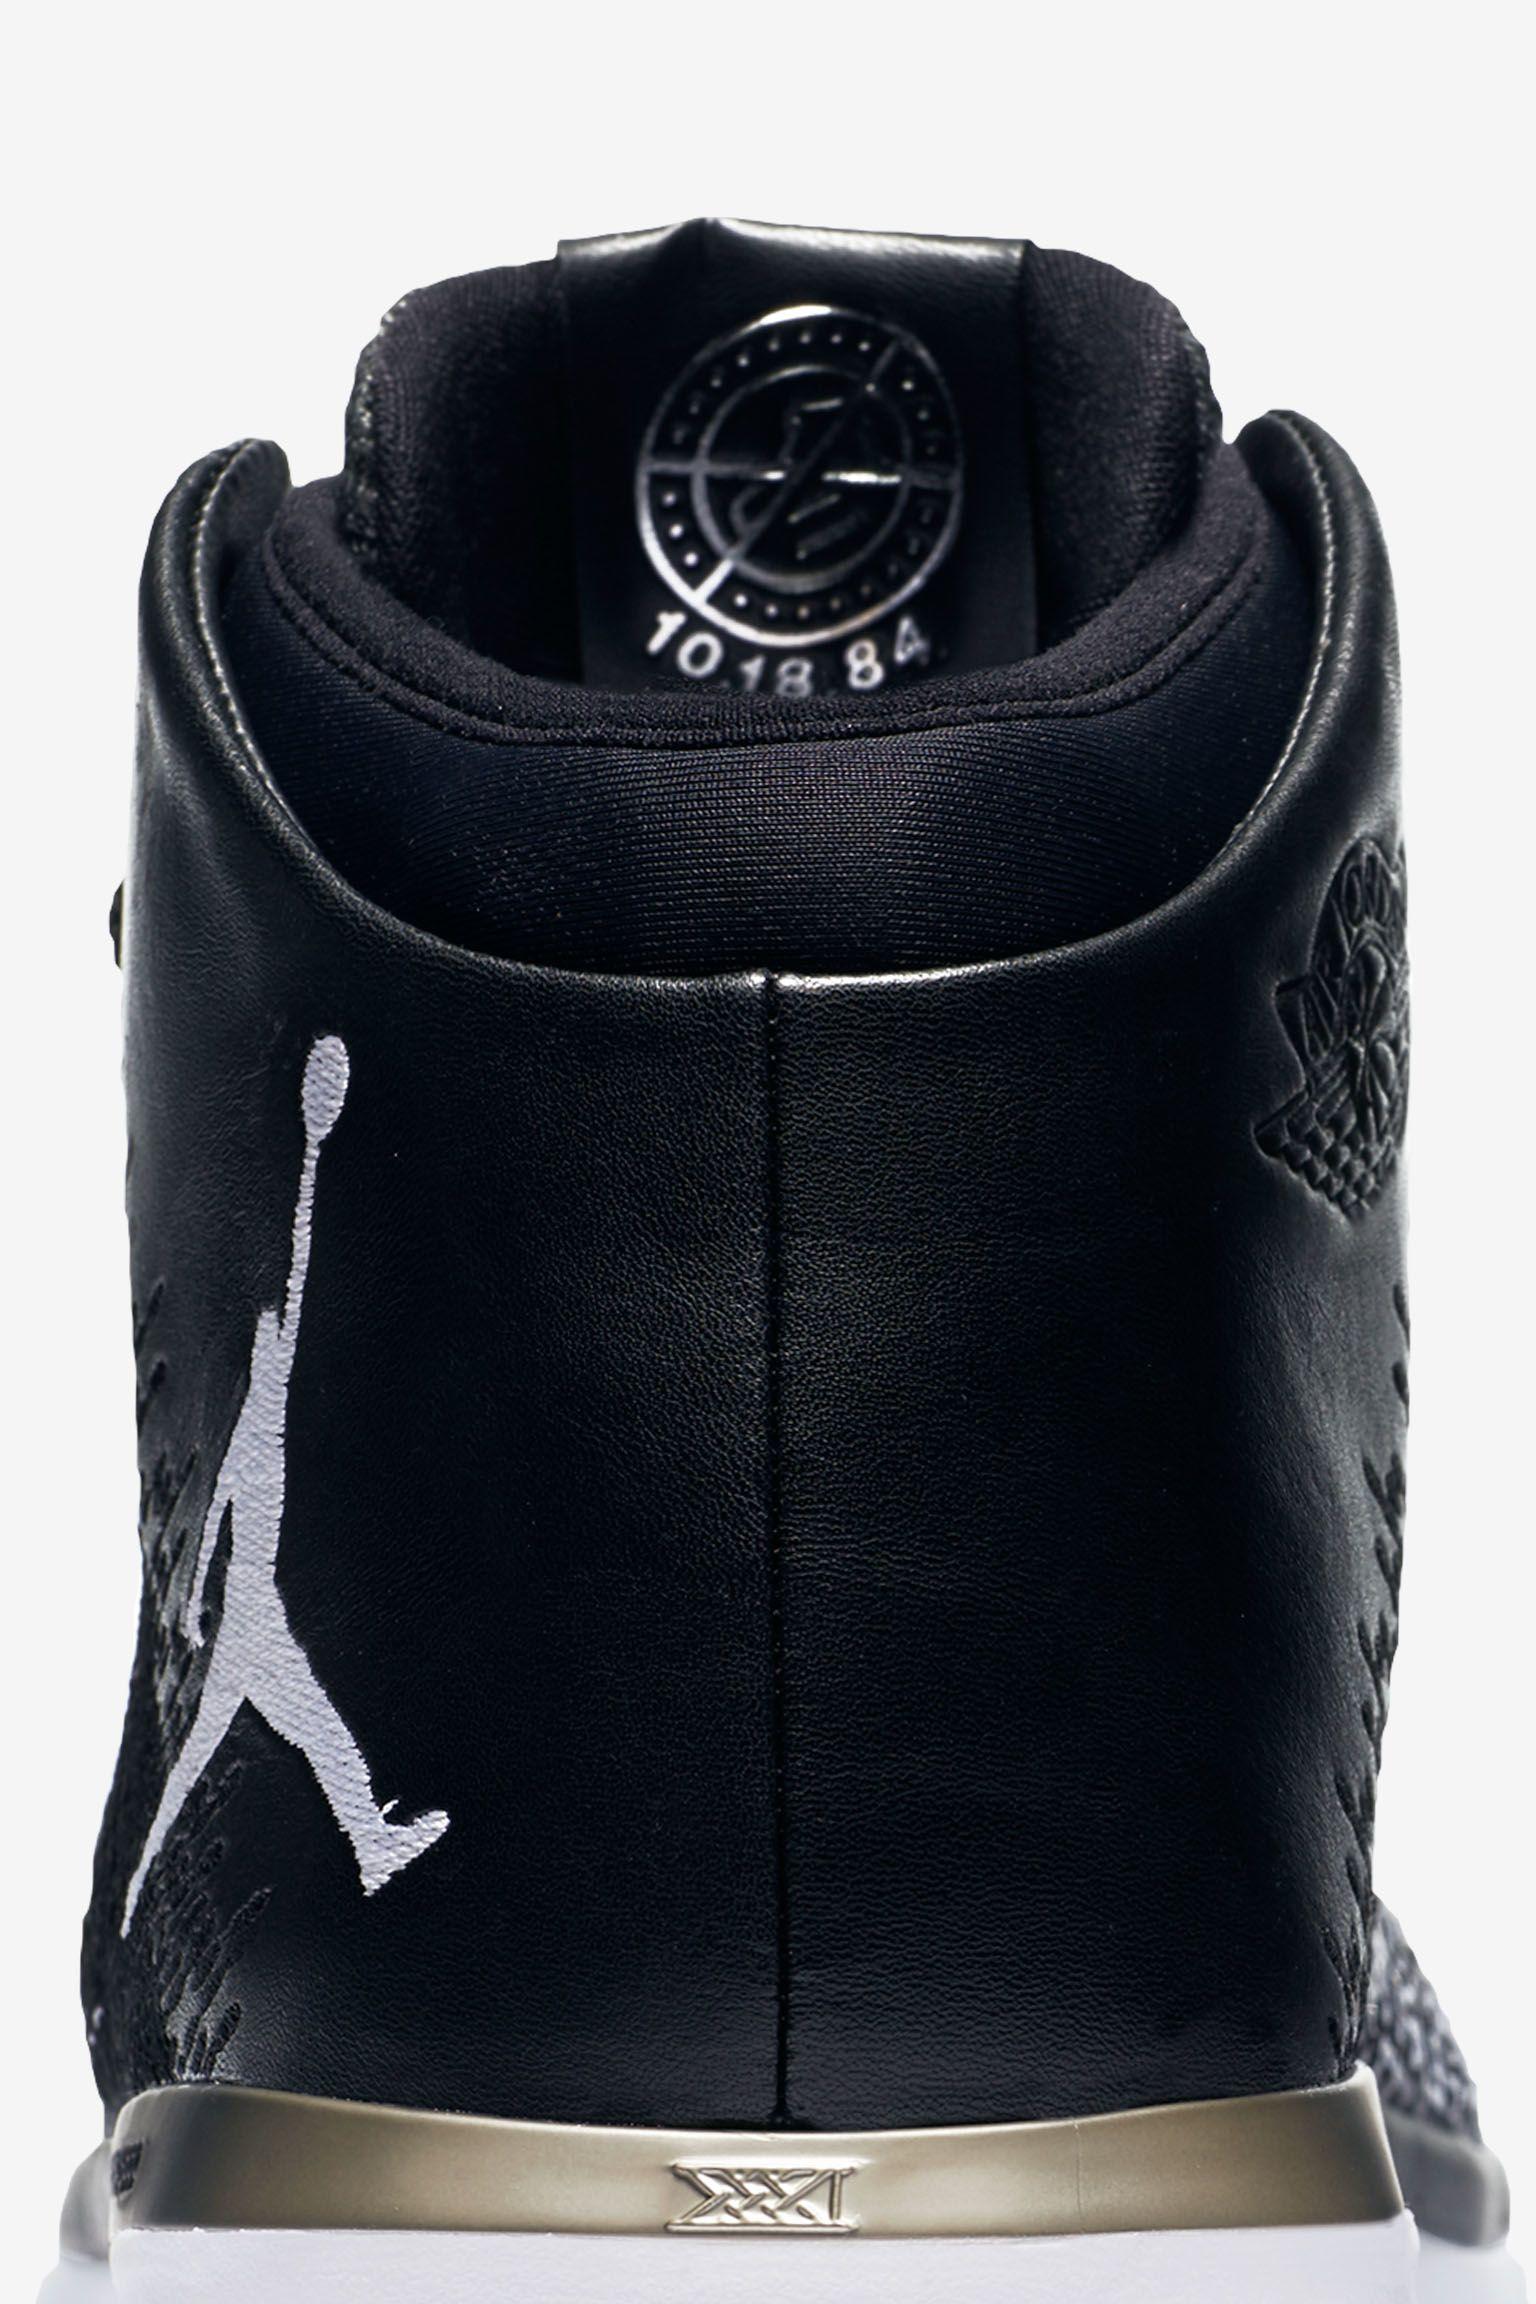 Air Jordan 31 'Fine Print' Release Date